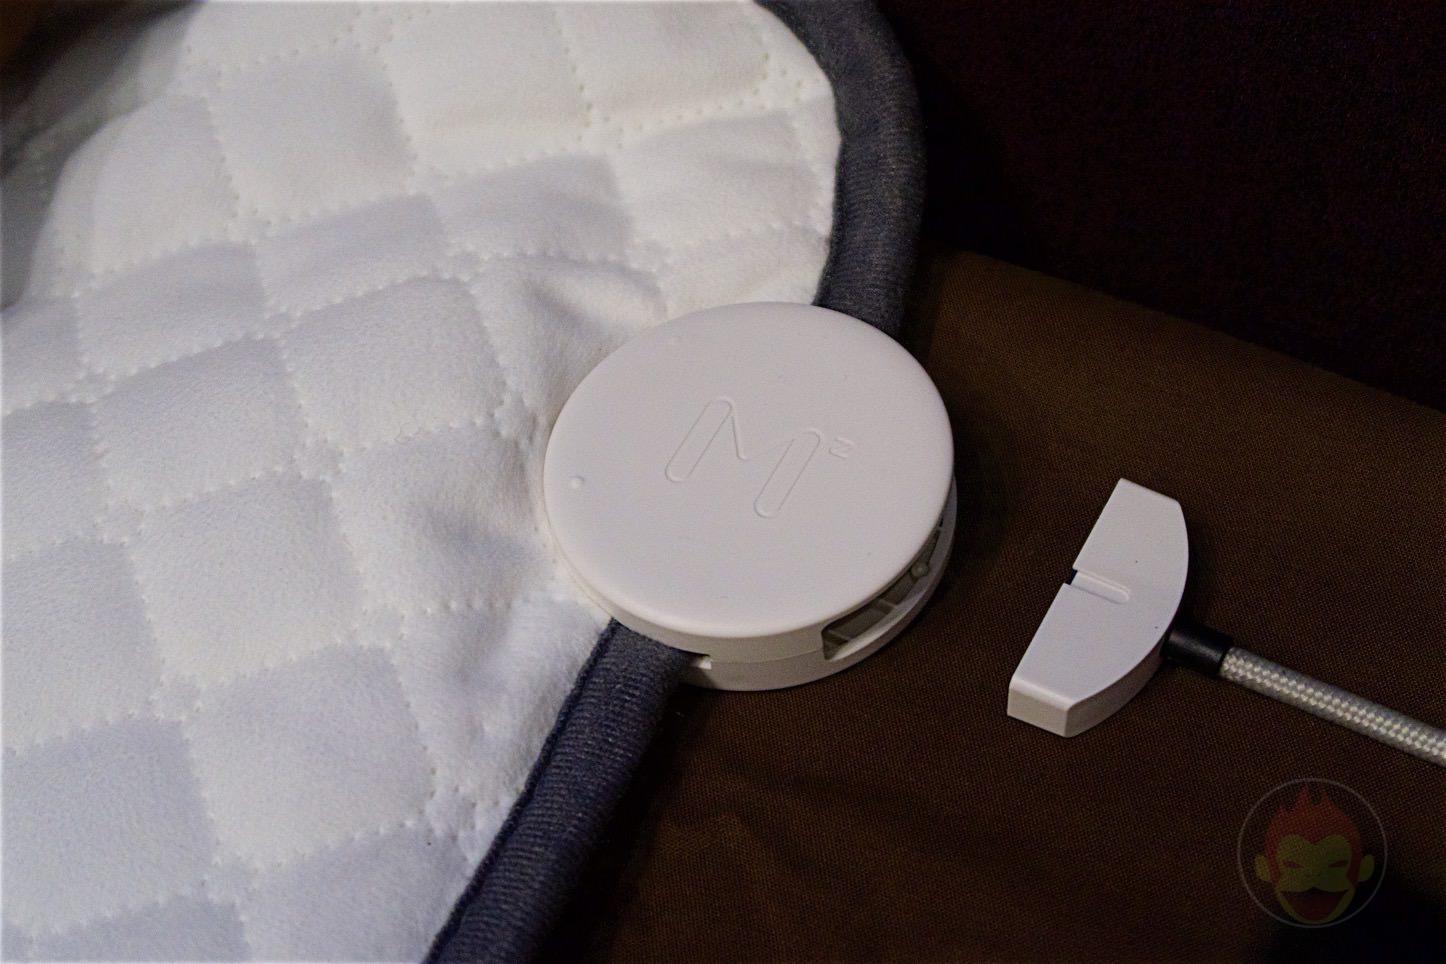 Mooring-by-mirahome-iot-mattress-03.jpg